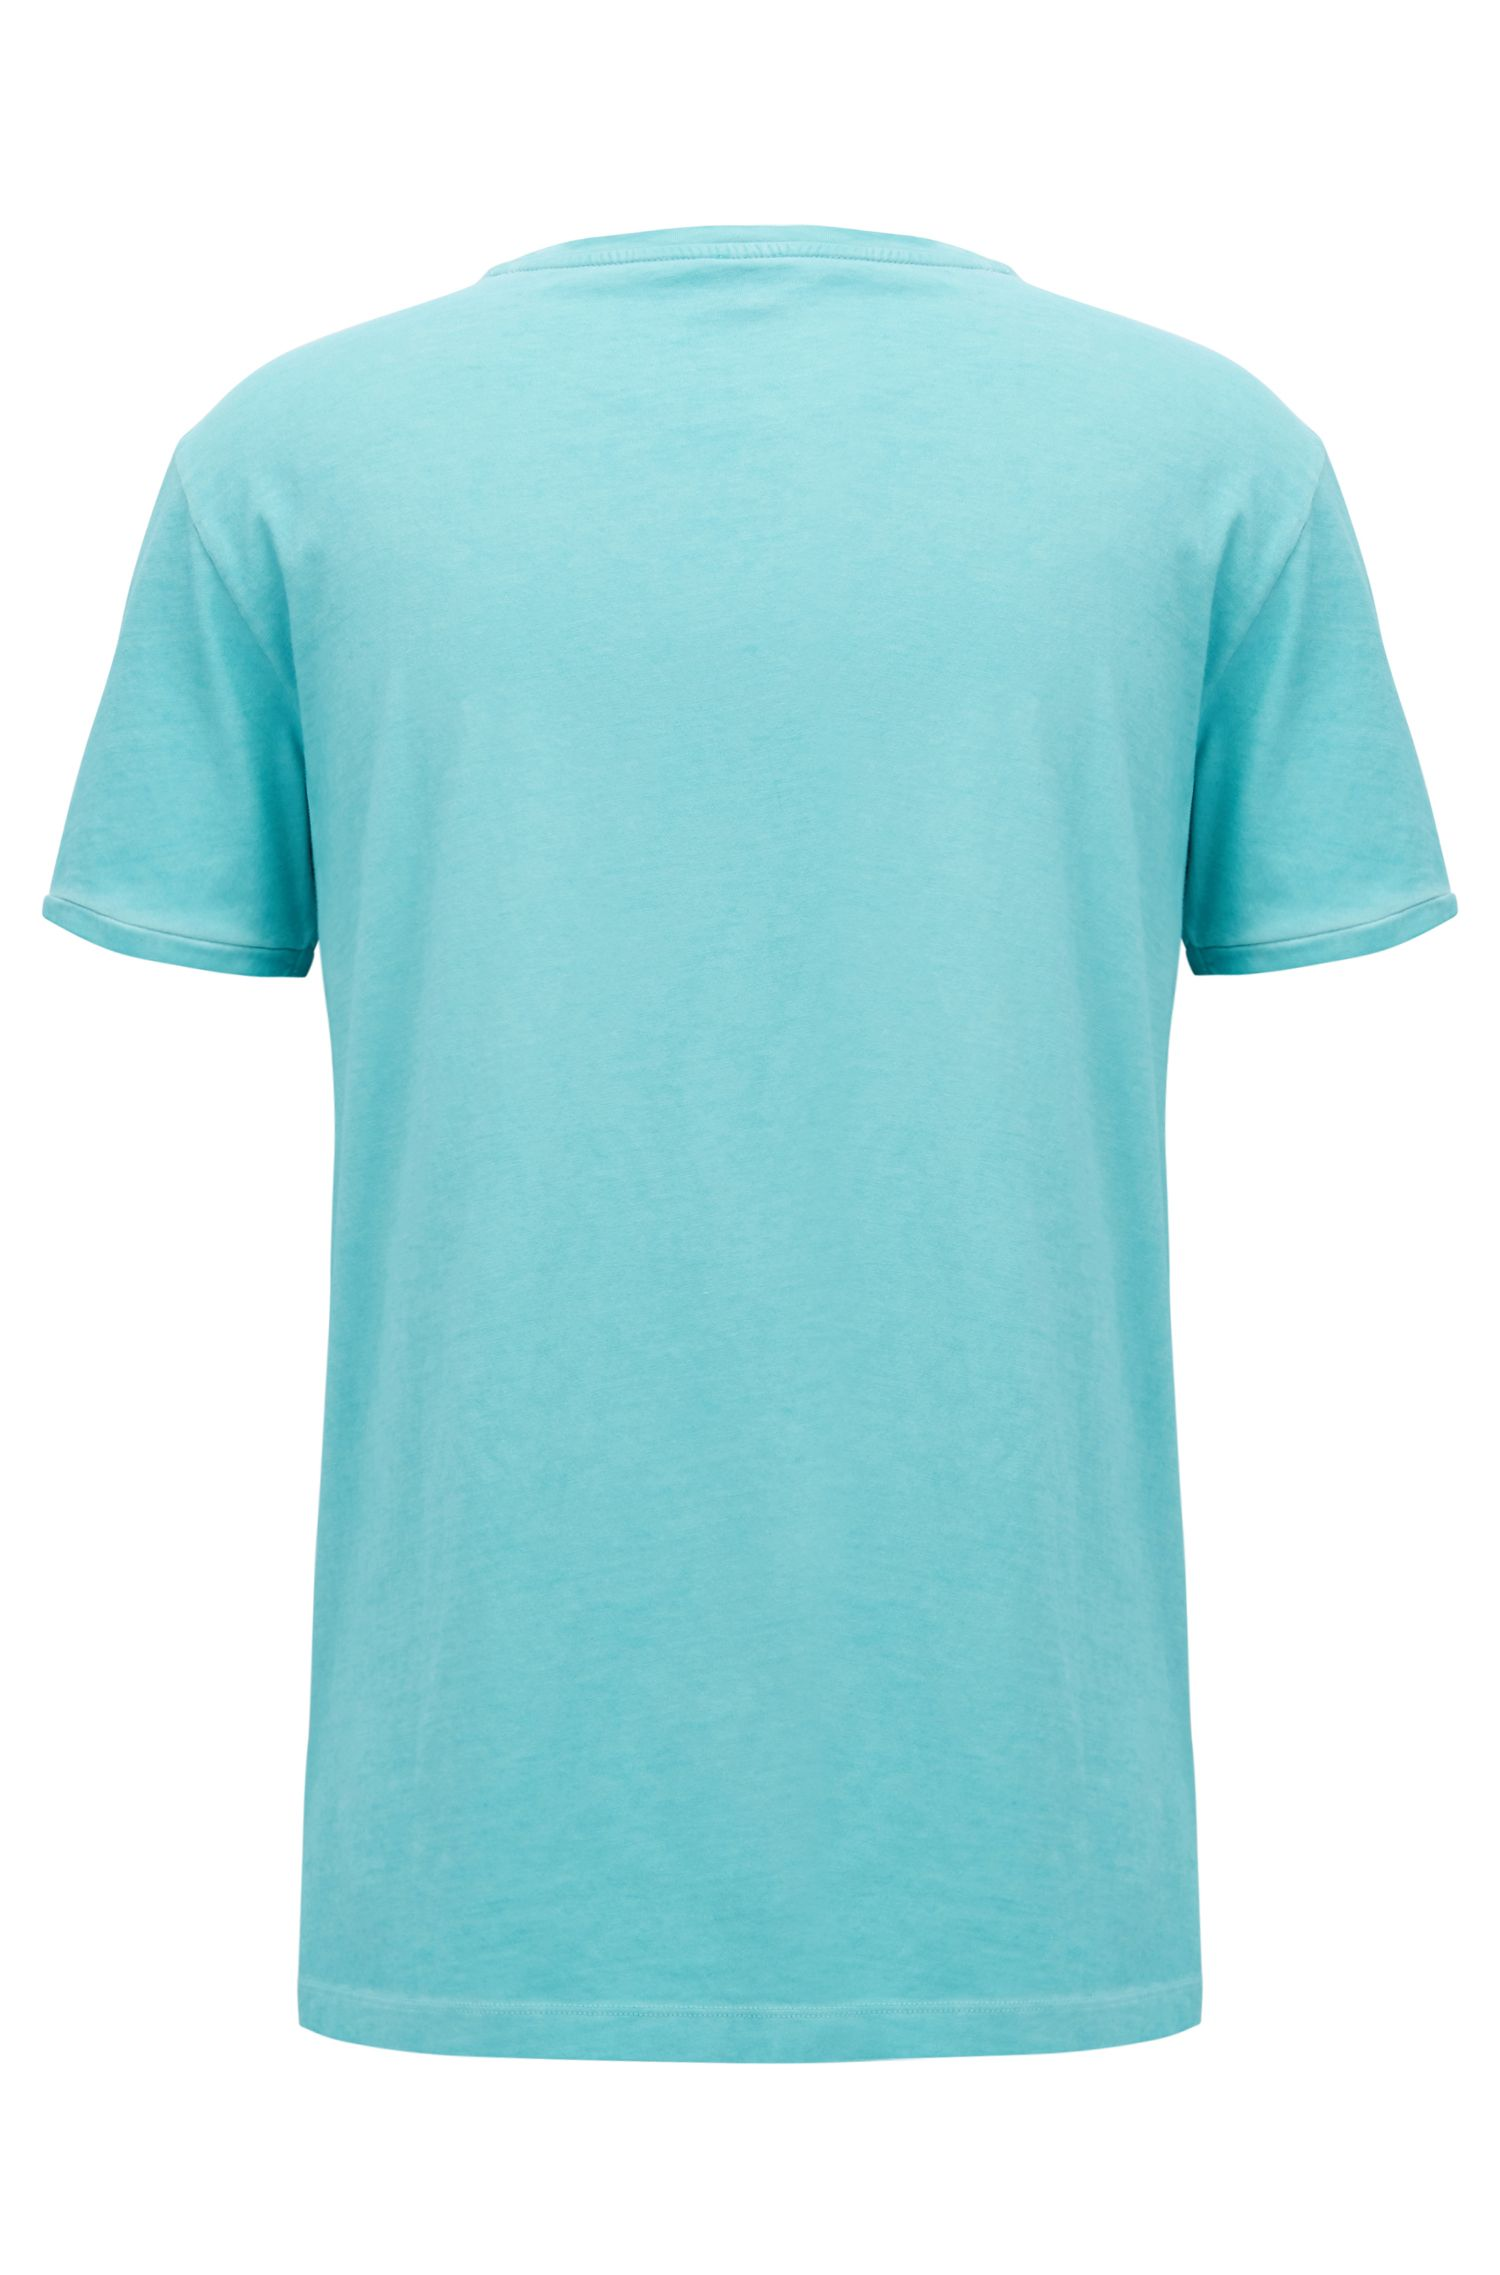 T-Shirt aus Baumwolle mit beflocktem Logo